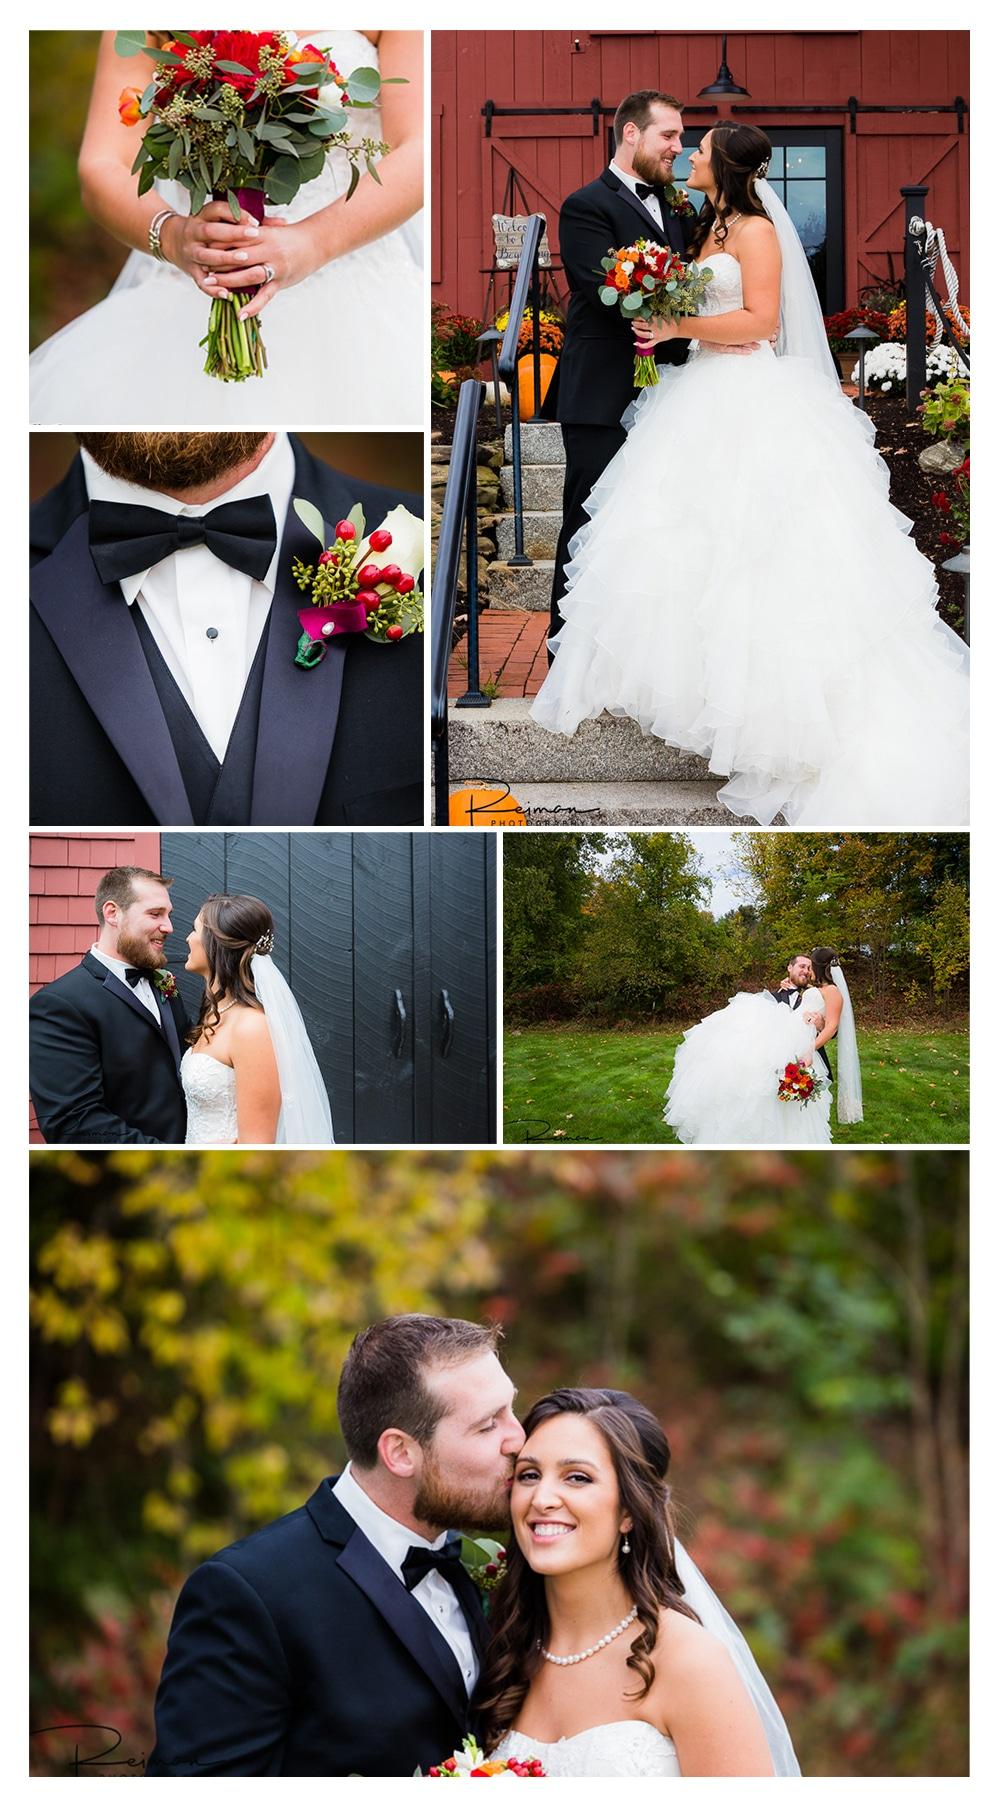 Barn at Wight Farm Wedding, Reiman Photogrpahy, Sturbridge, Wedding Photography